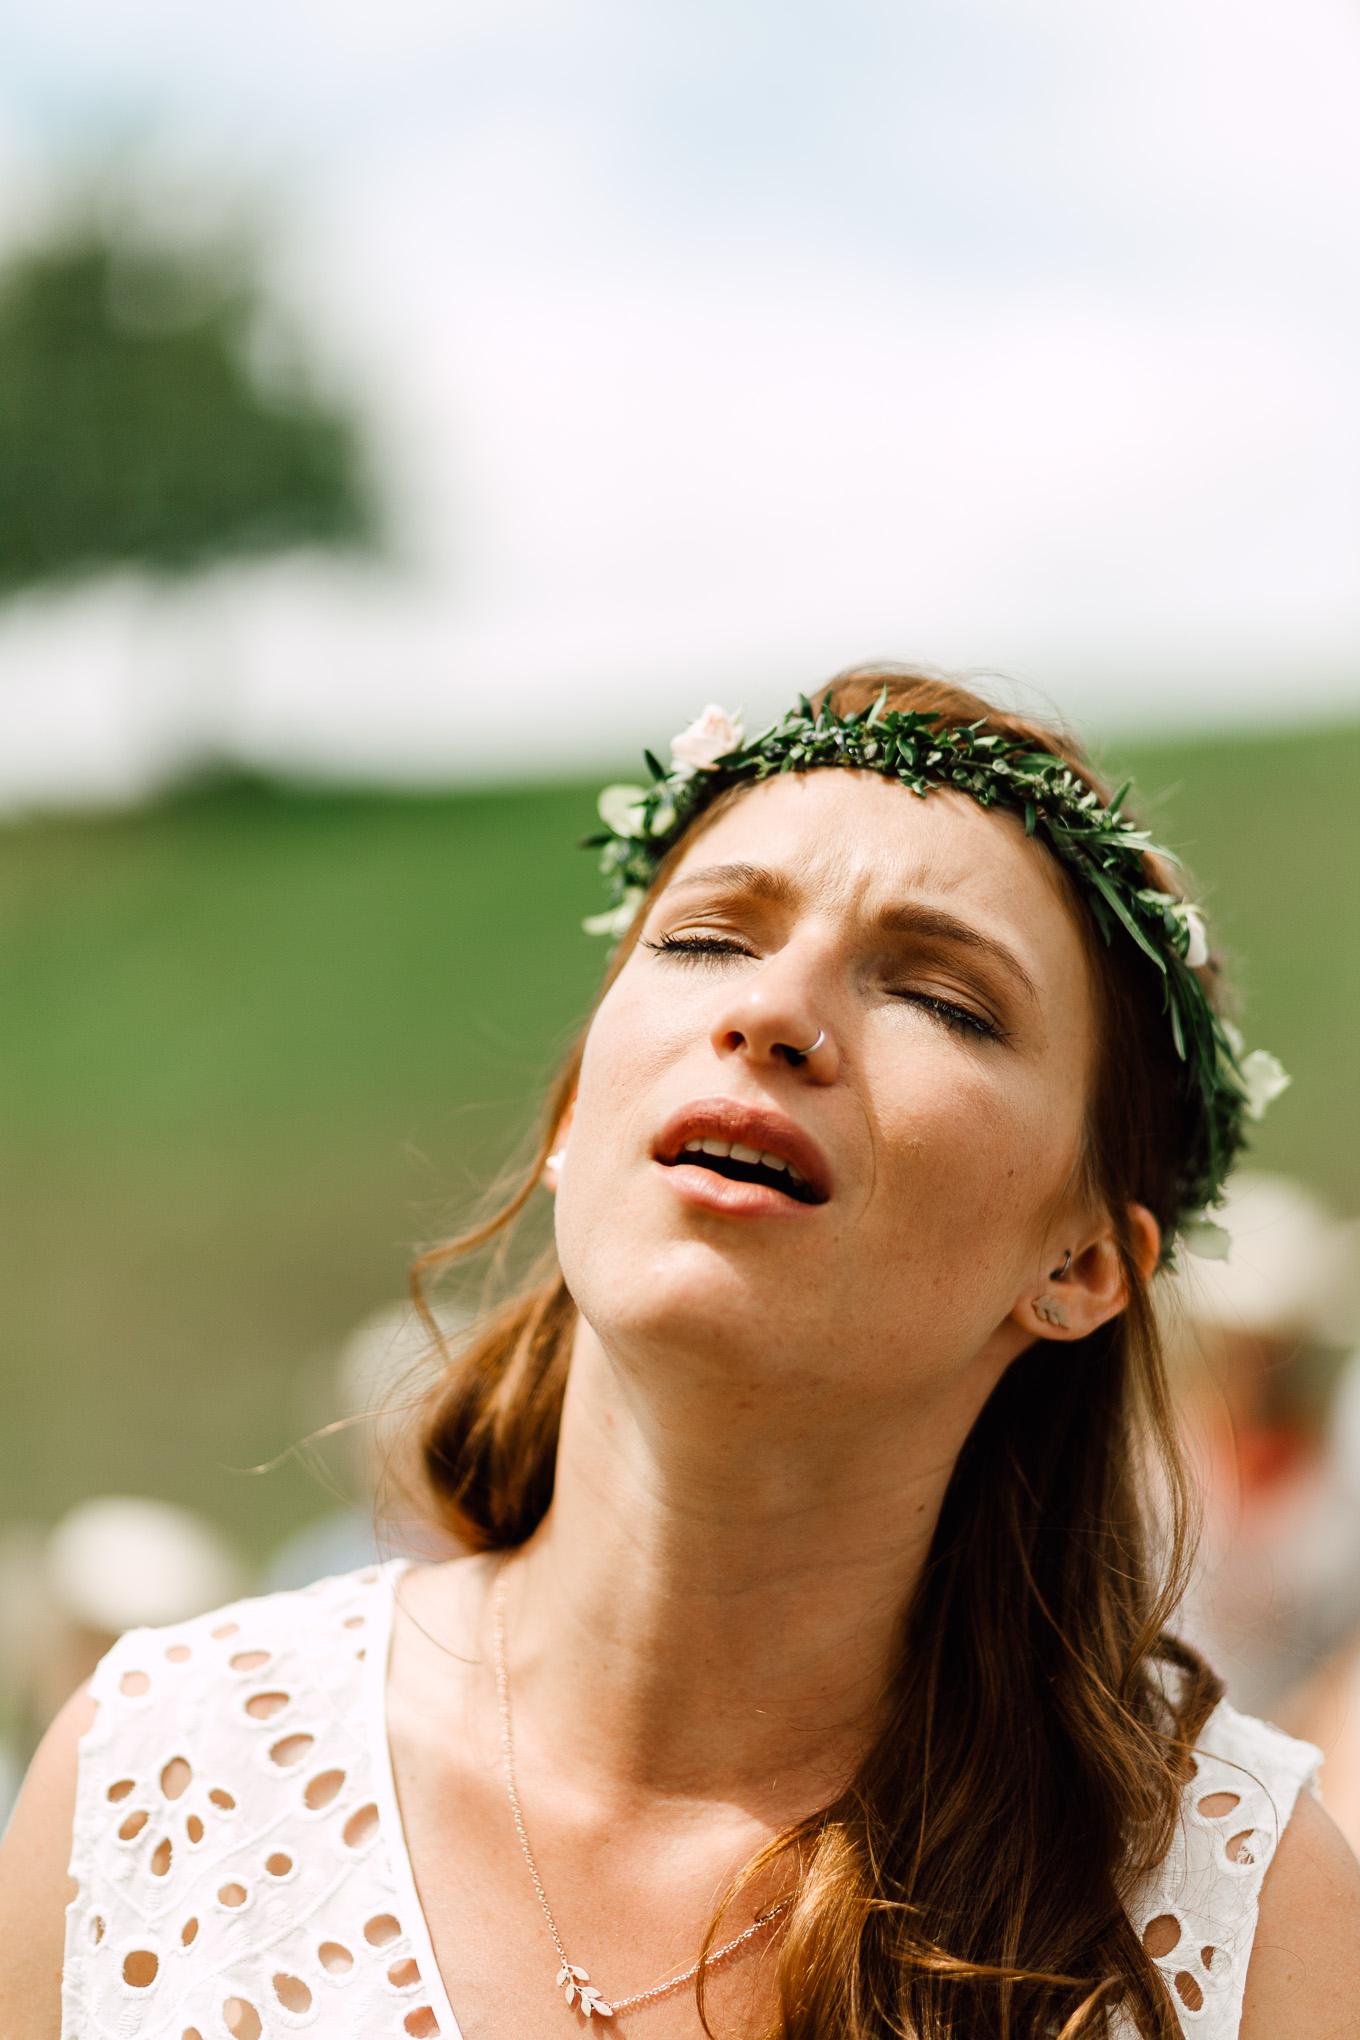 Boho-Scheune-Bauern-Hochzeit-Lörrach-Rheinfelden-Pia-Anna-Christian-Photography-NC-31.jpg